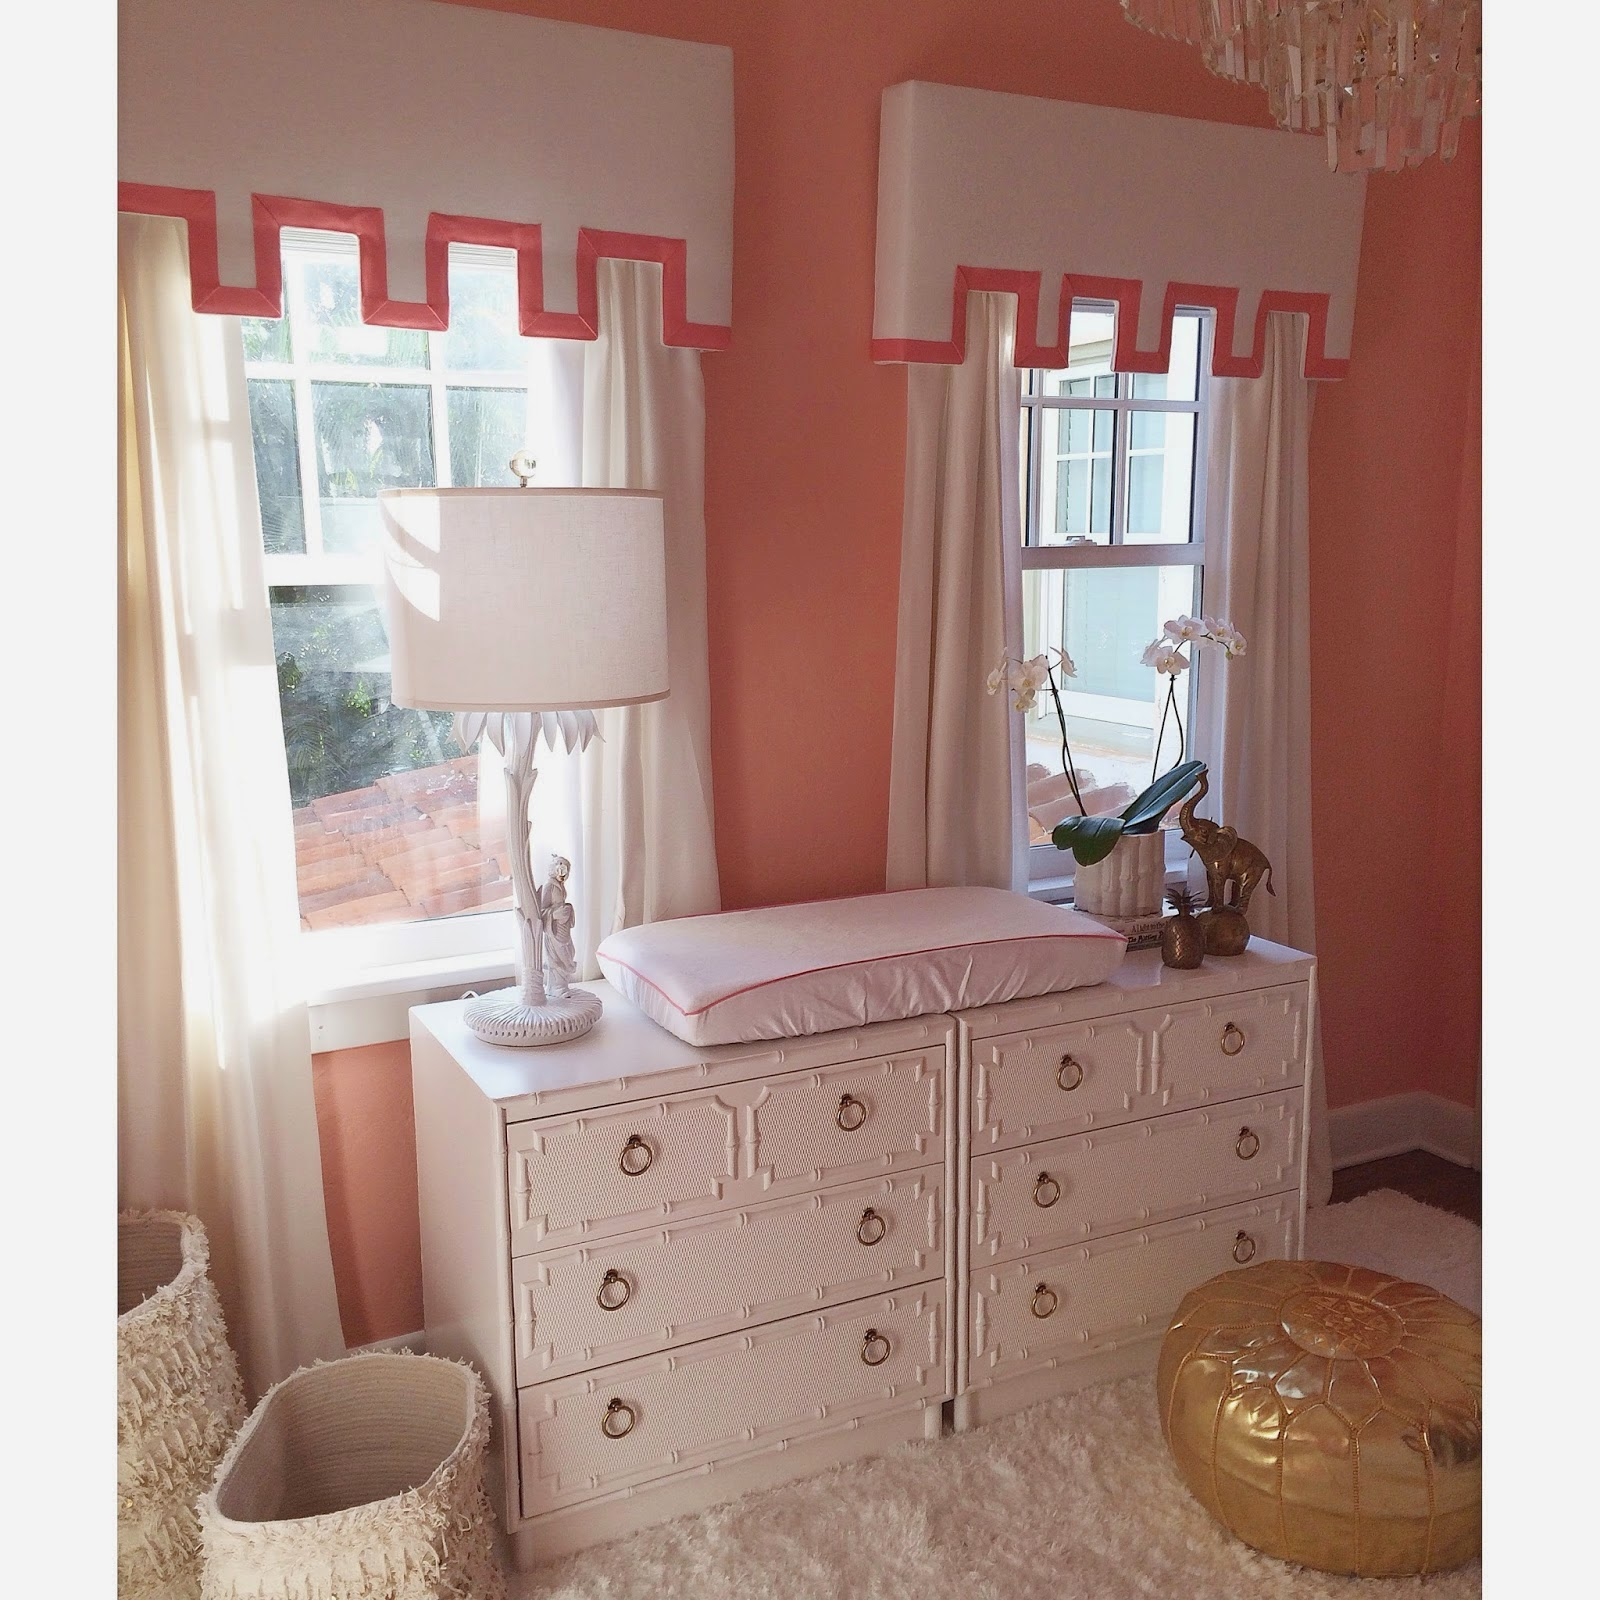 custom-drapes-palm-beach-chic-nursery